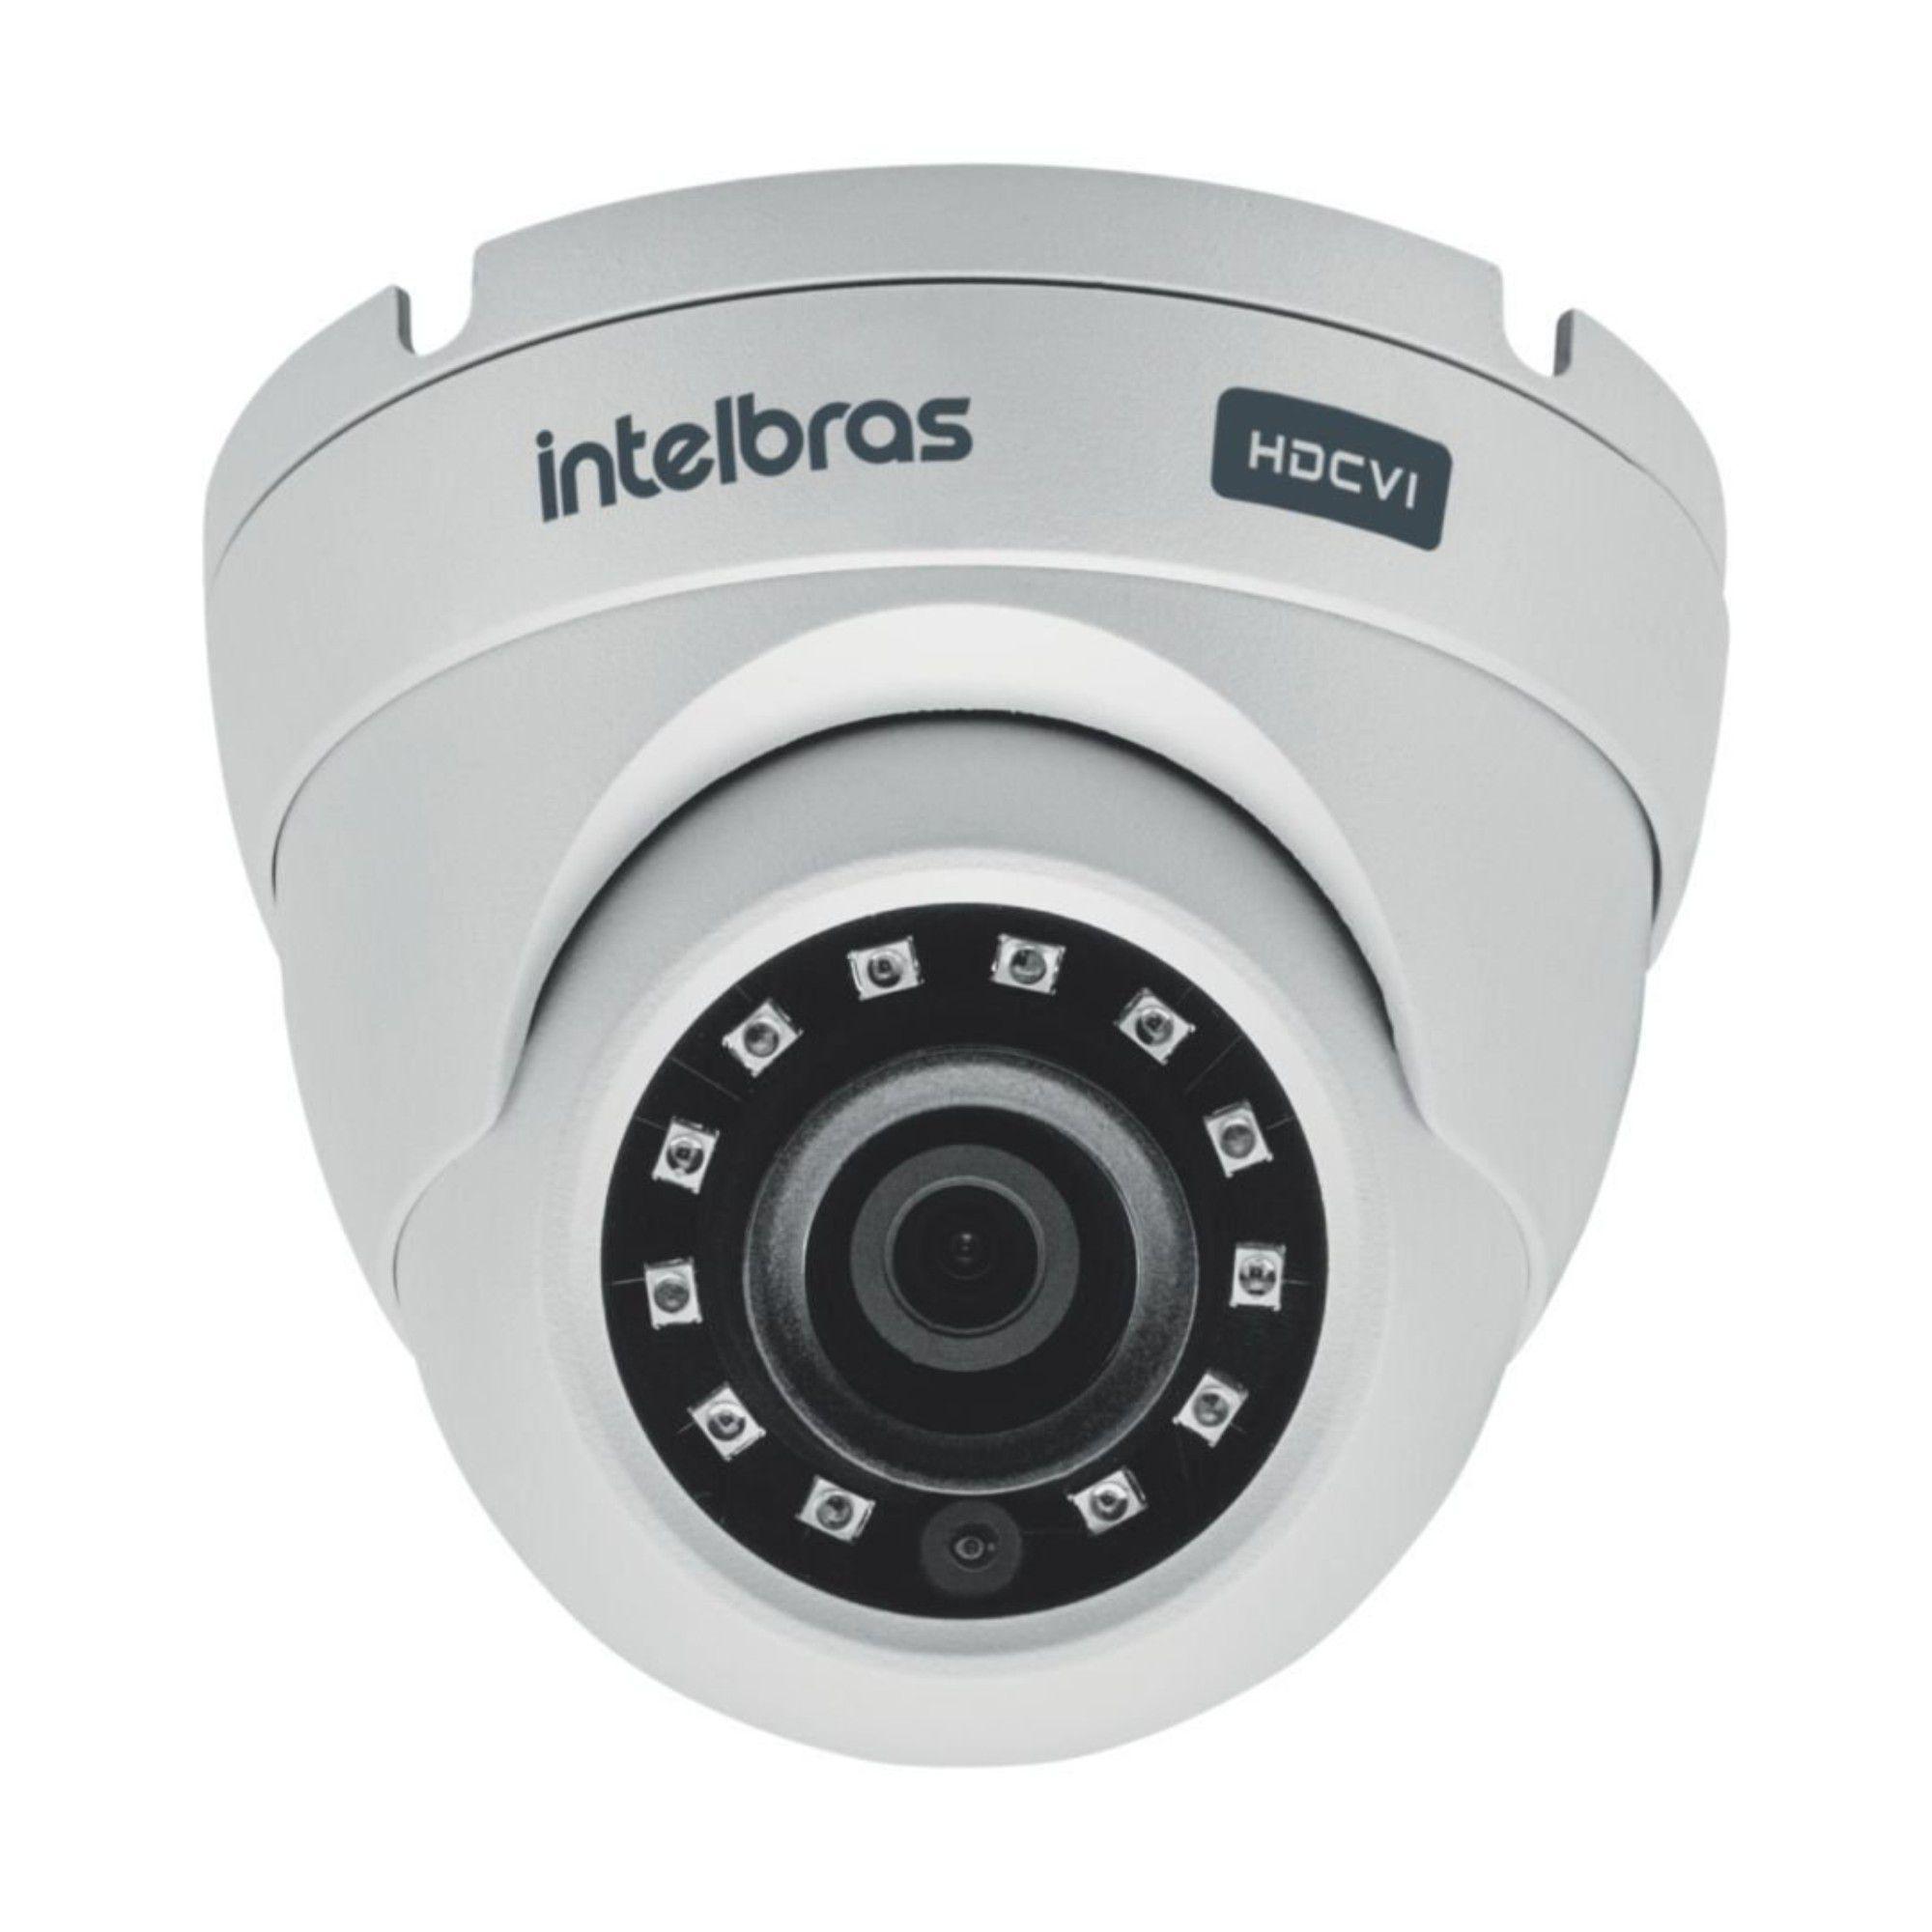 Kit CFTV Intelbras Completo 2 Câmeras AHD 720p DVR 4 Canais